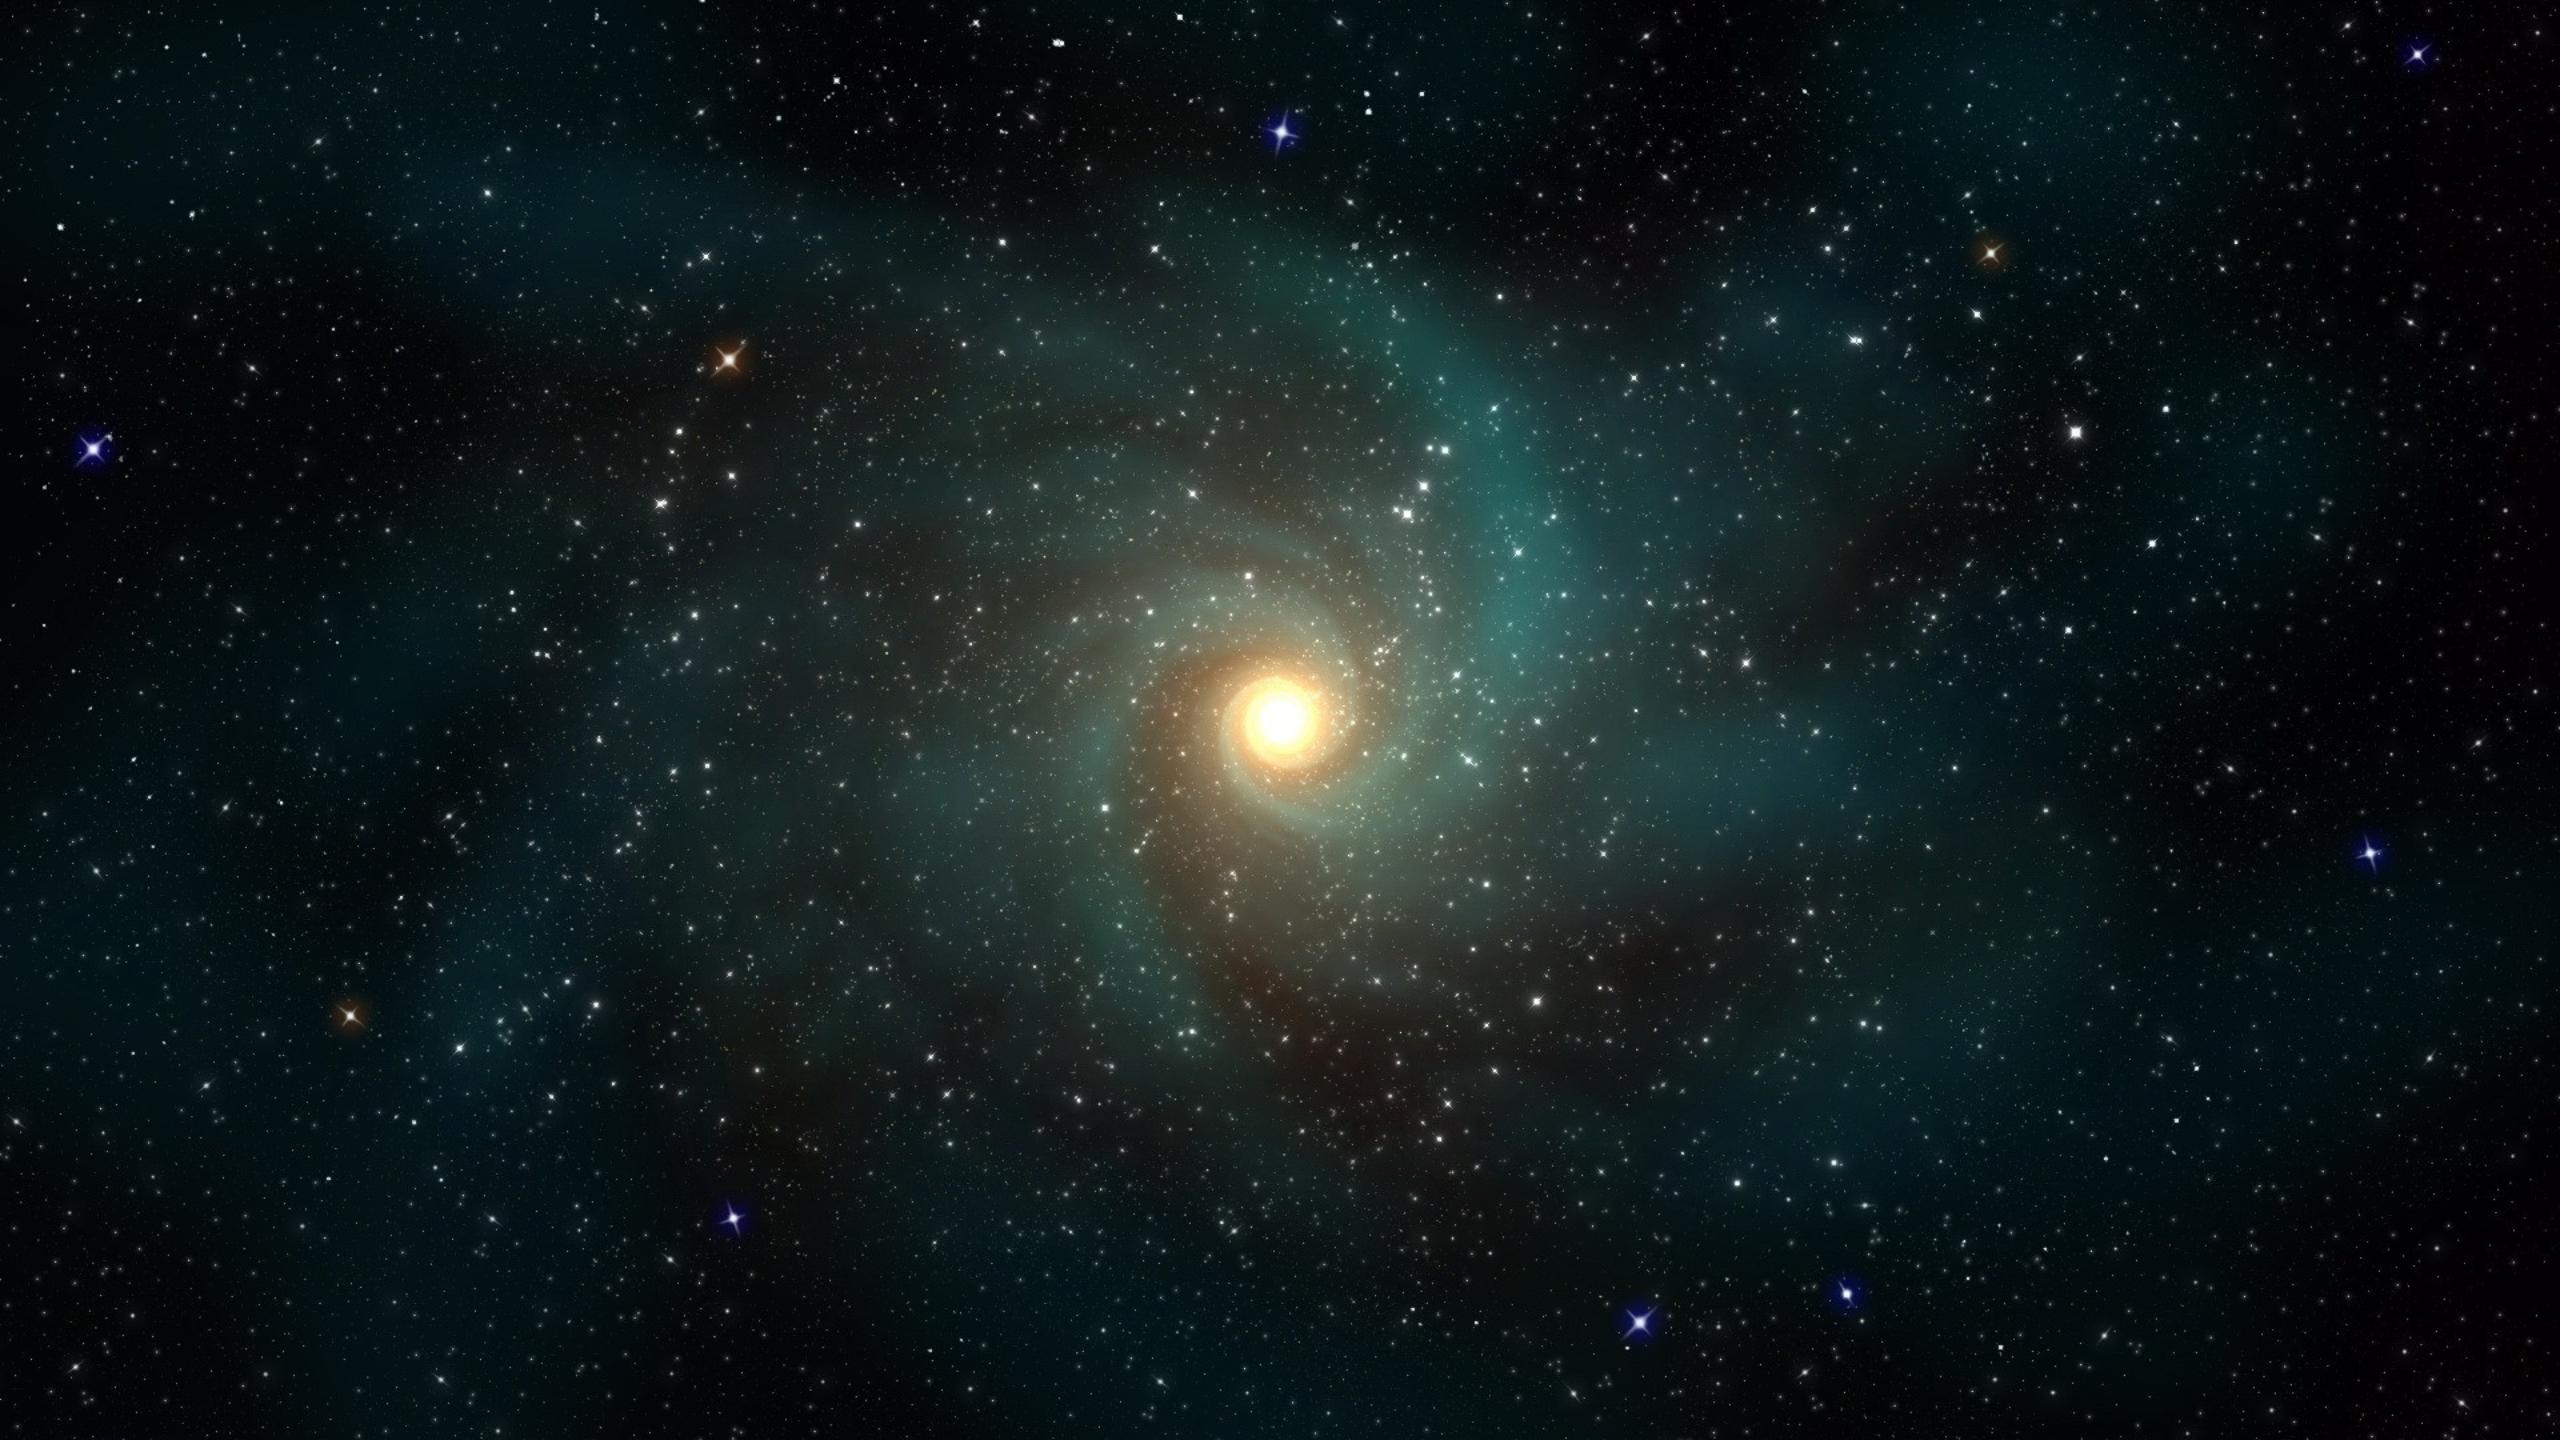 обои Galaxy Wallpapers раздел космос размер 1920x1200 Hd